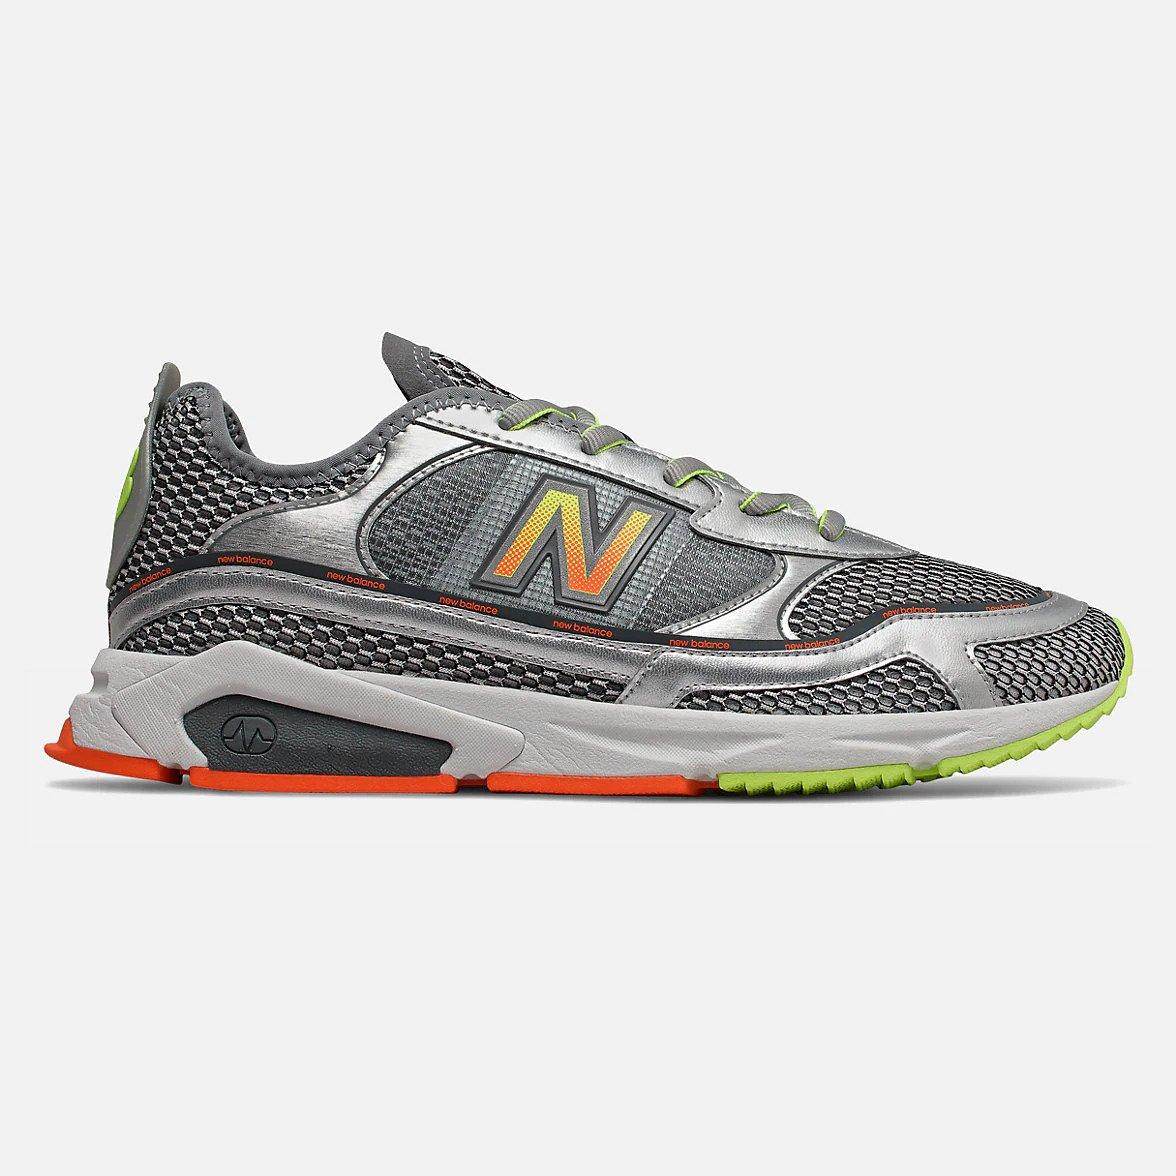 new balance, x racer, silver metallic, korting, sneakers, end of season, sale